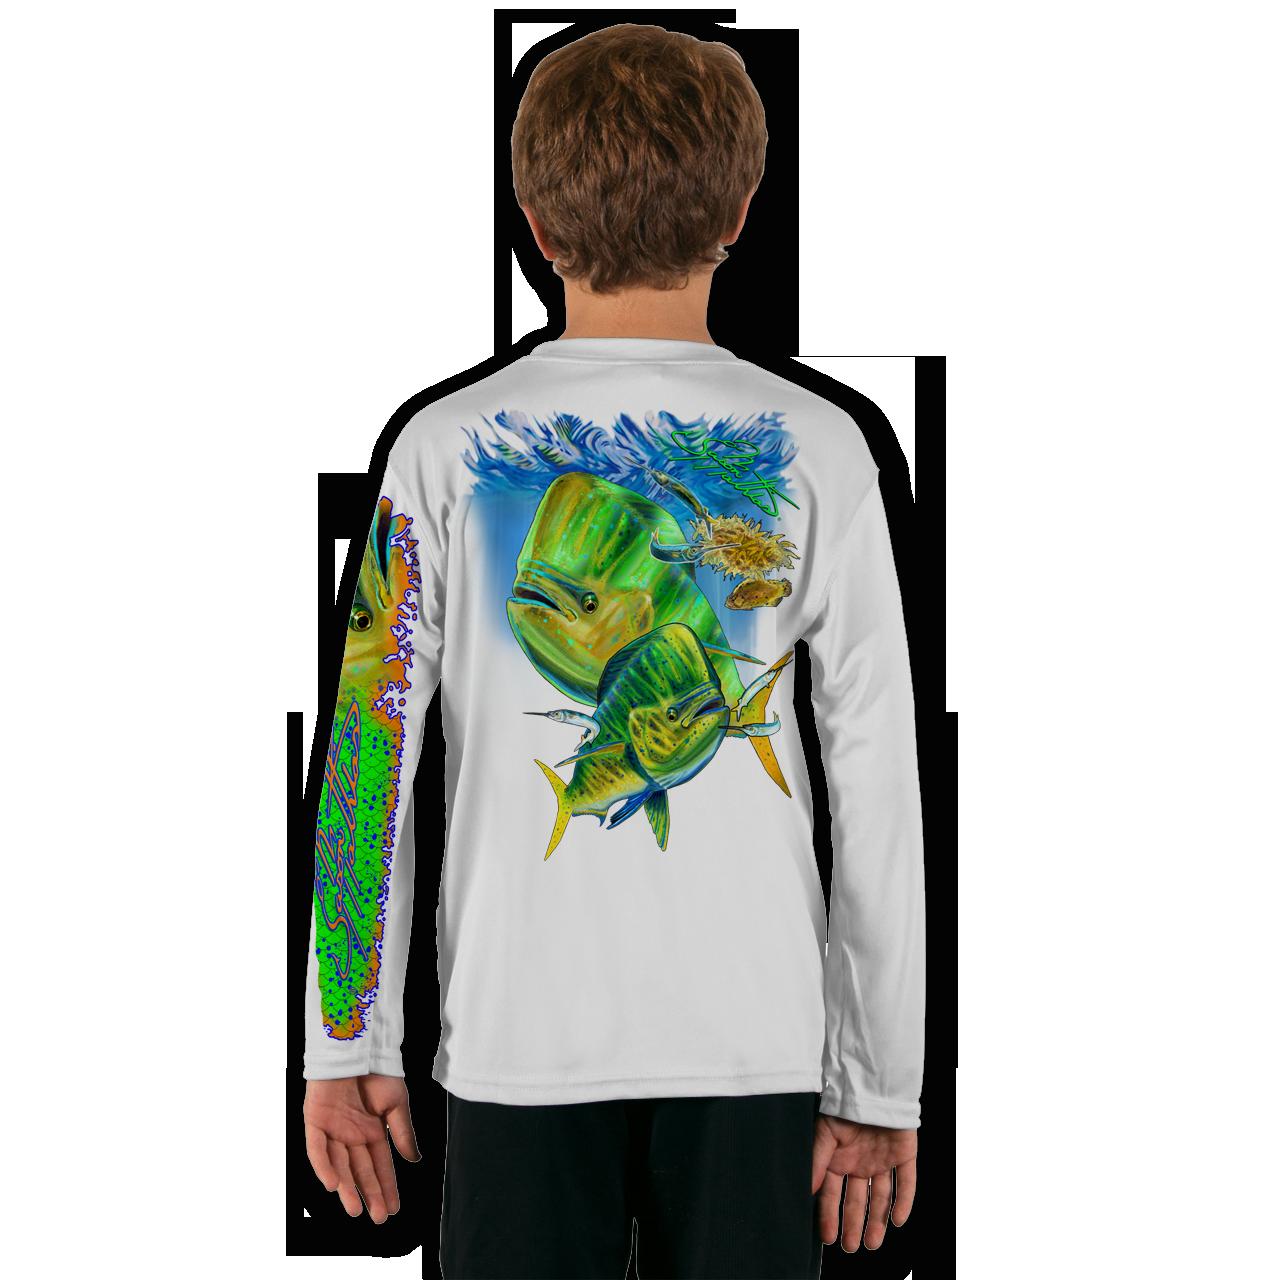 mahi-white-youth-solar-ls-back-performance-shirt.png